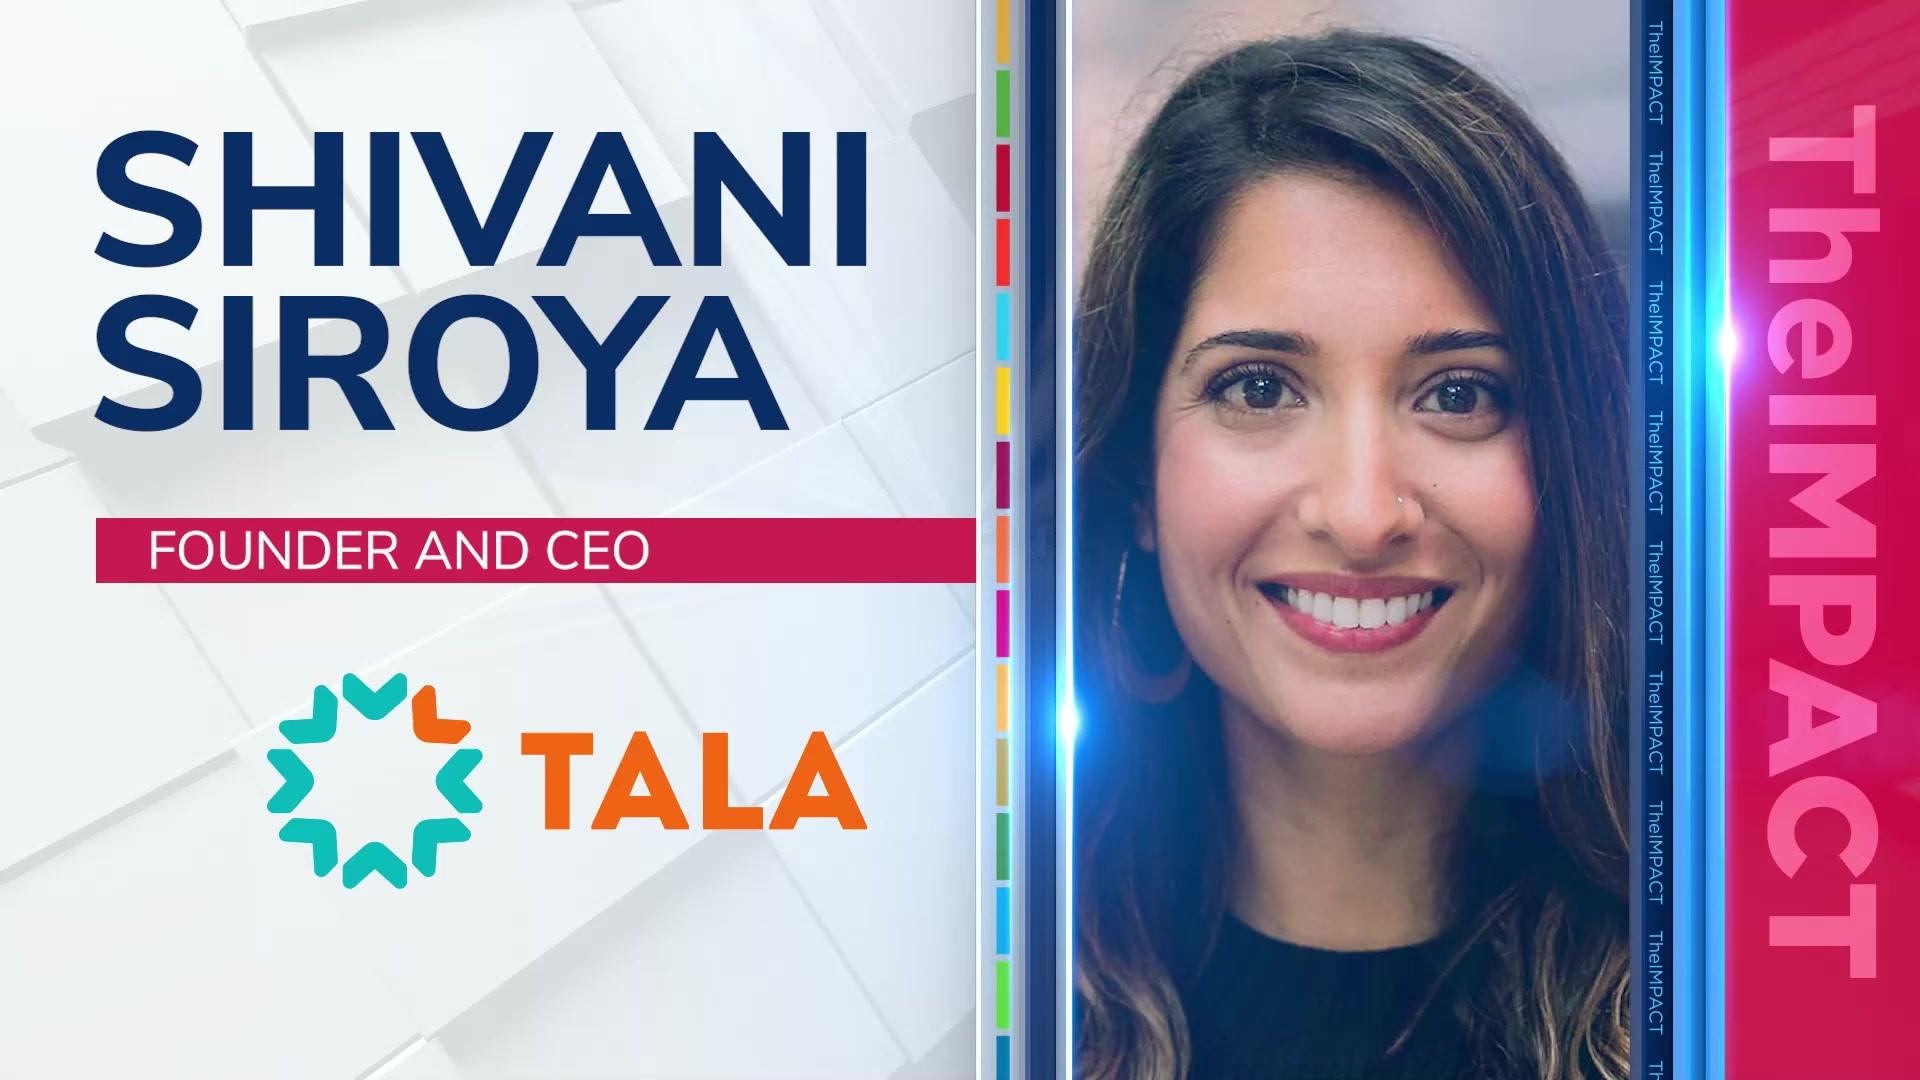 Shivani Siroya, Founder & CEO at Tala